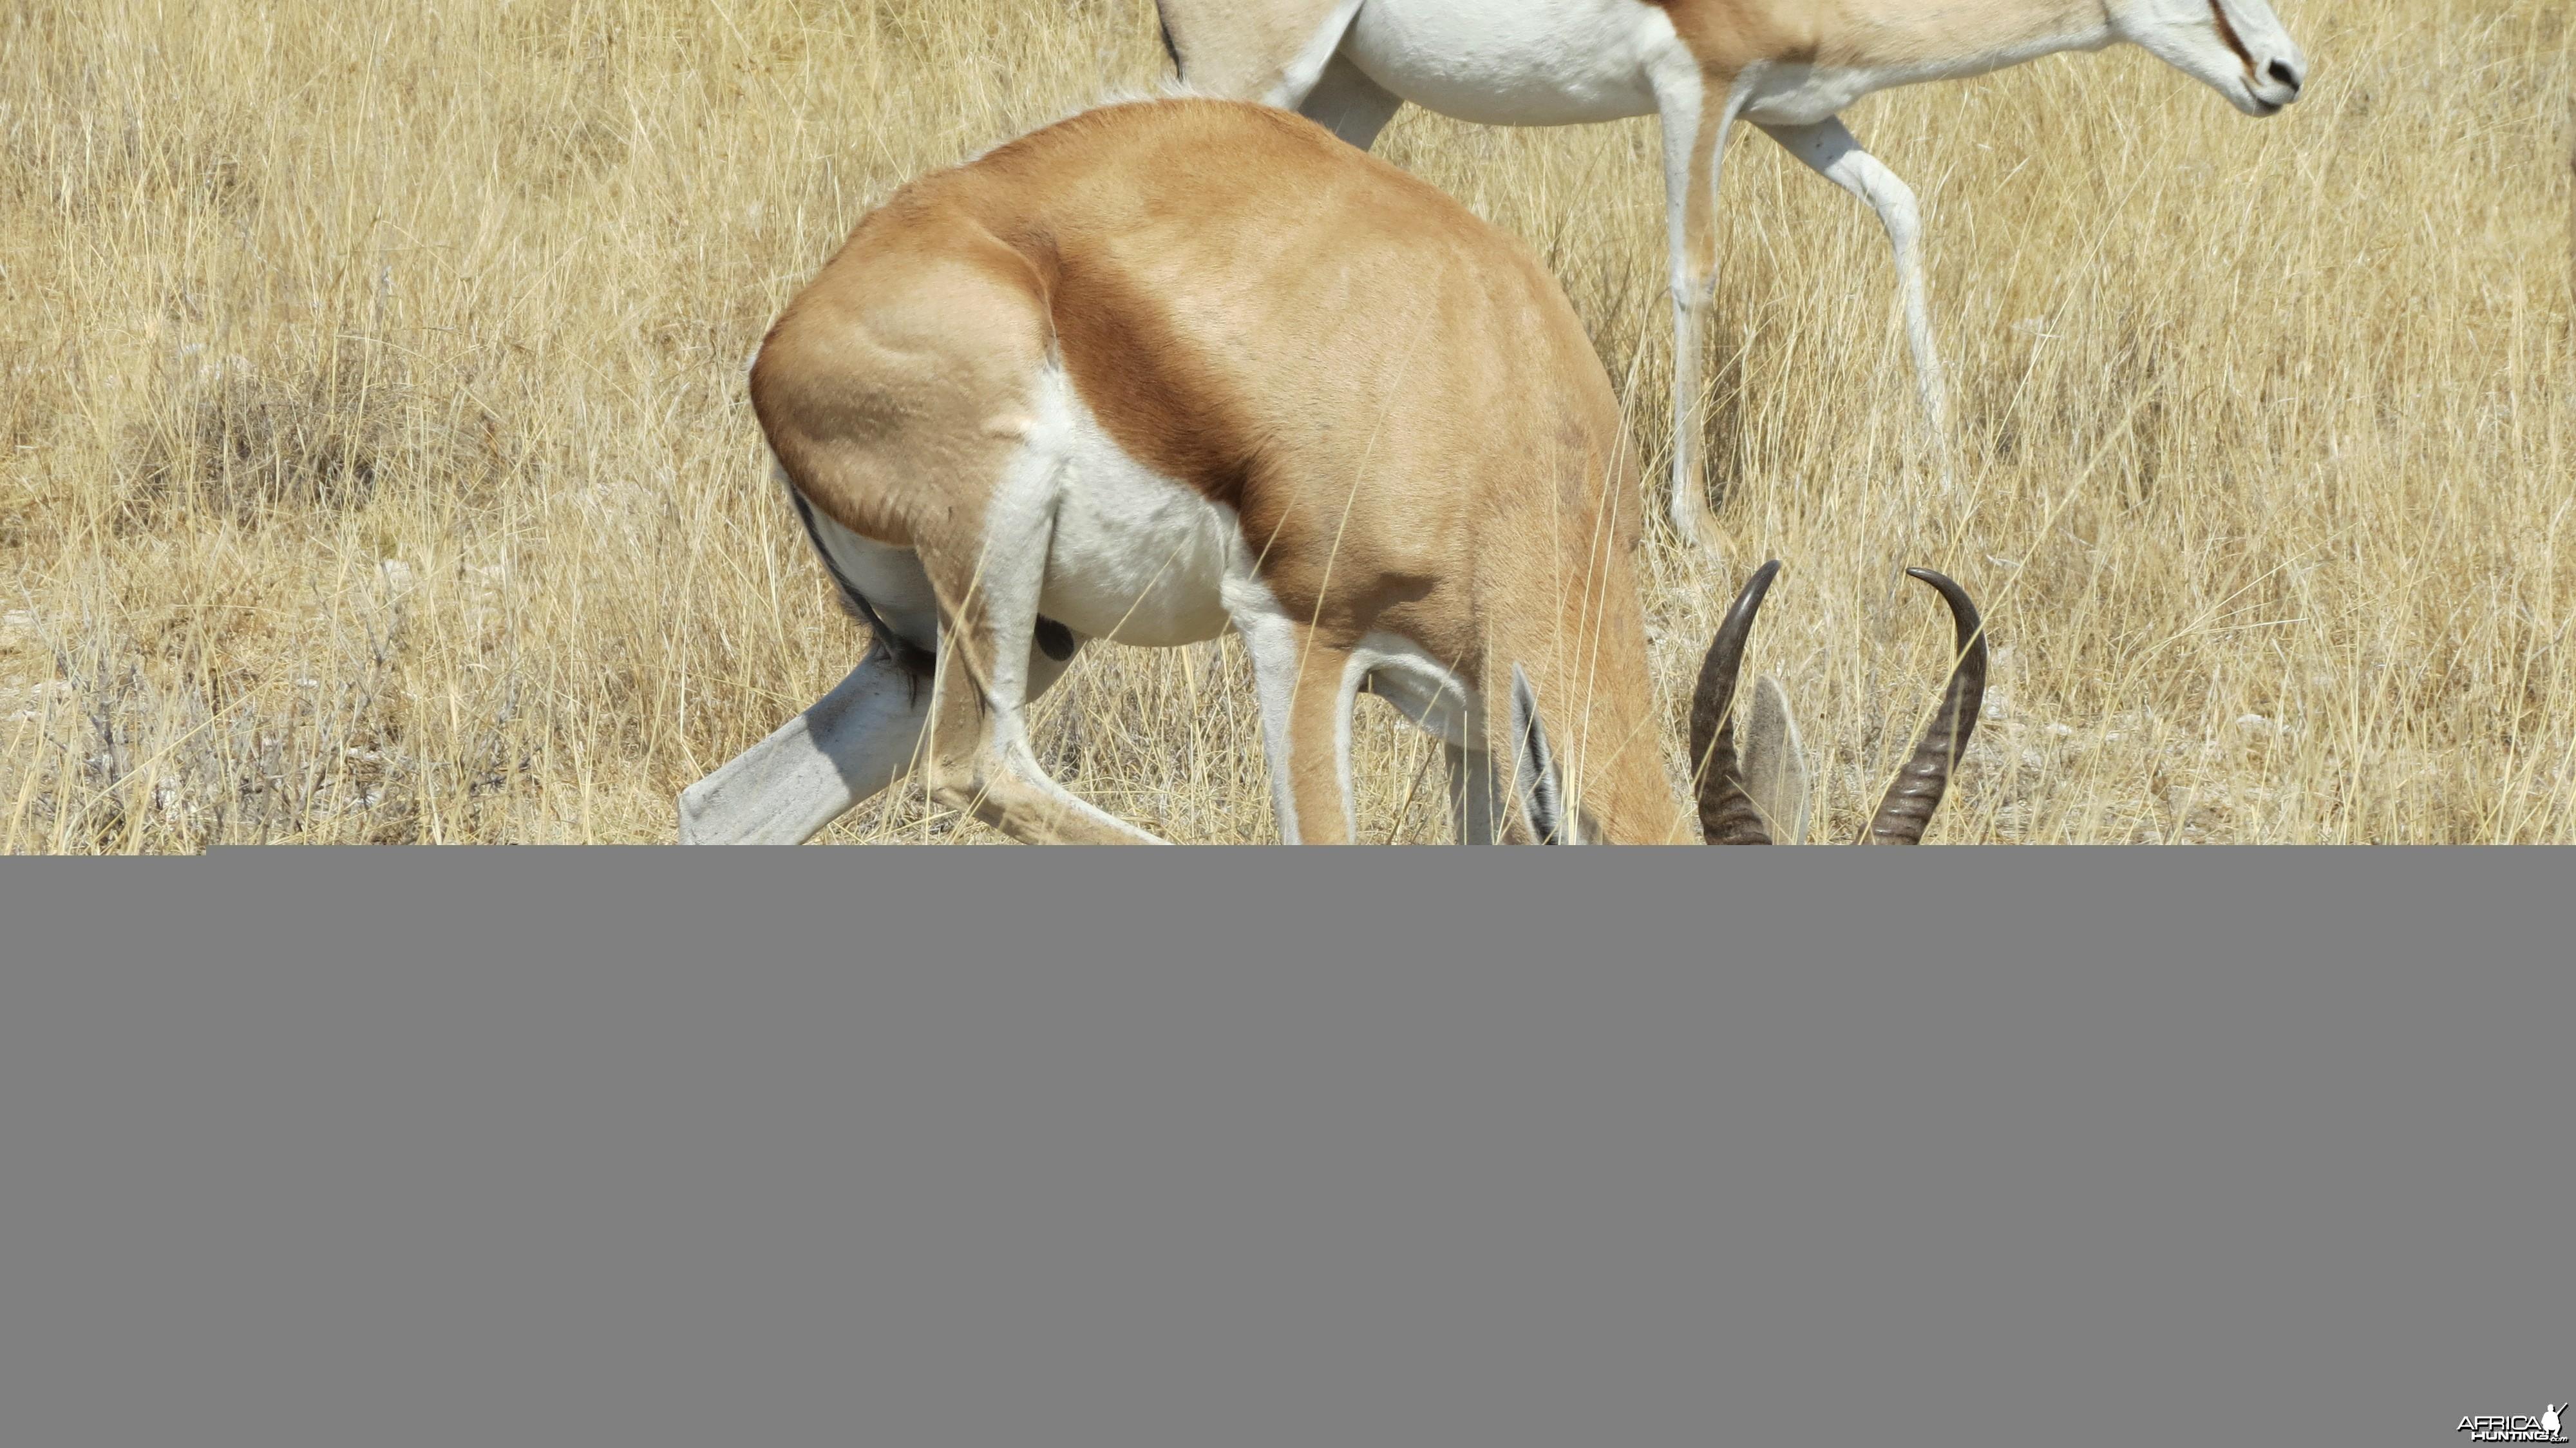 Springbok at Etosha National Park